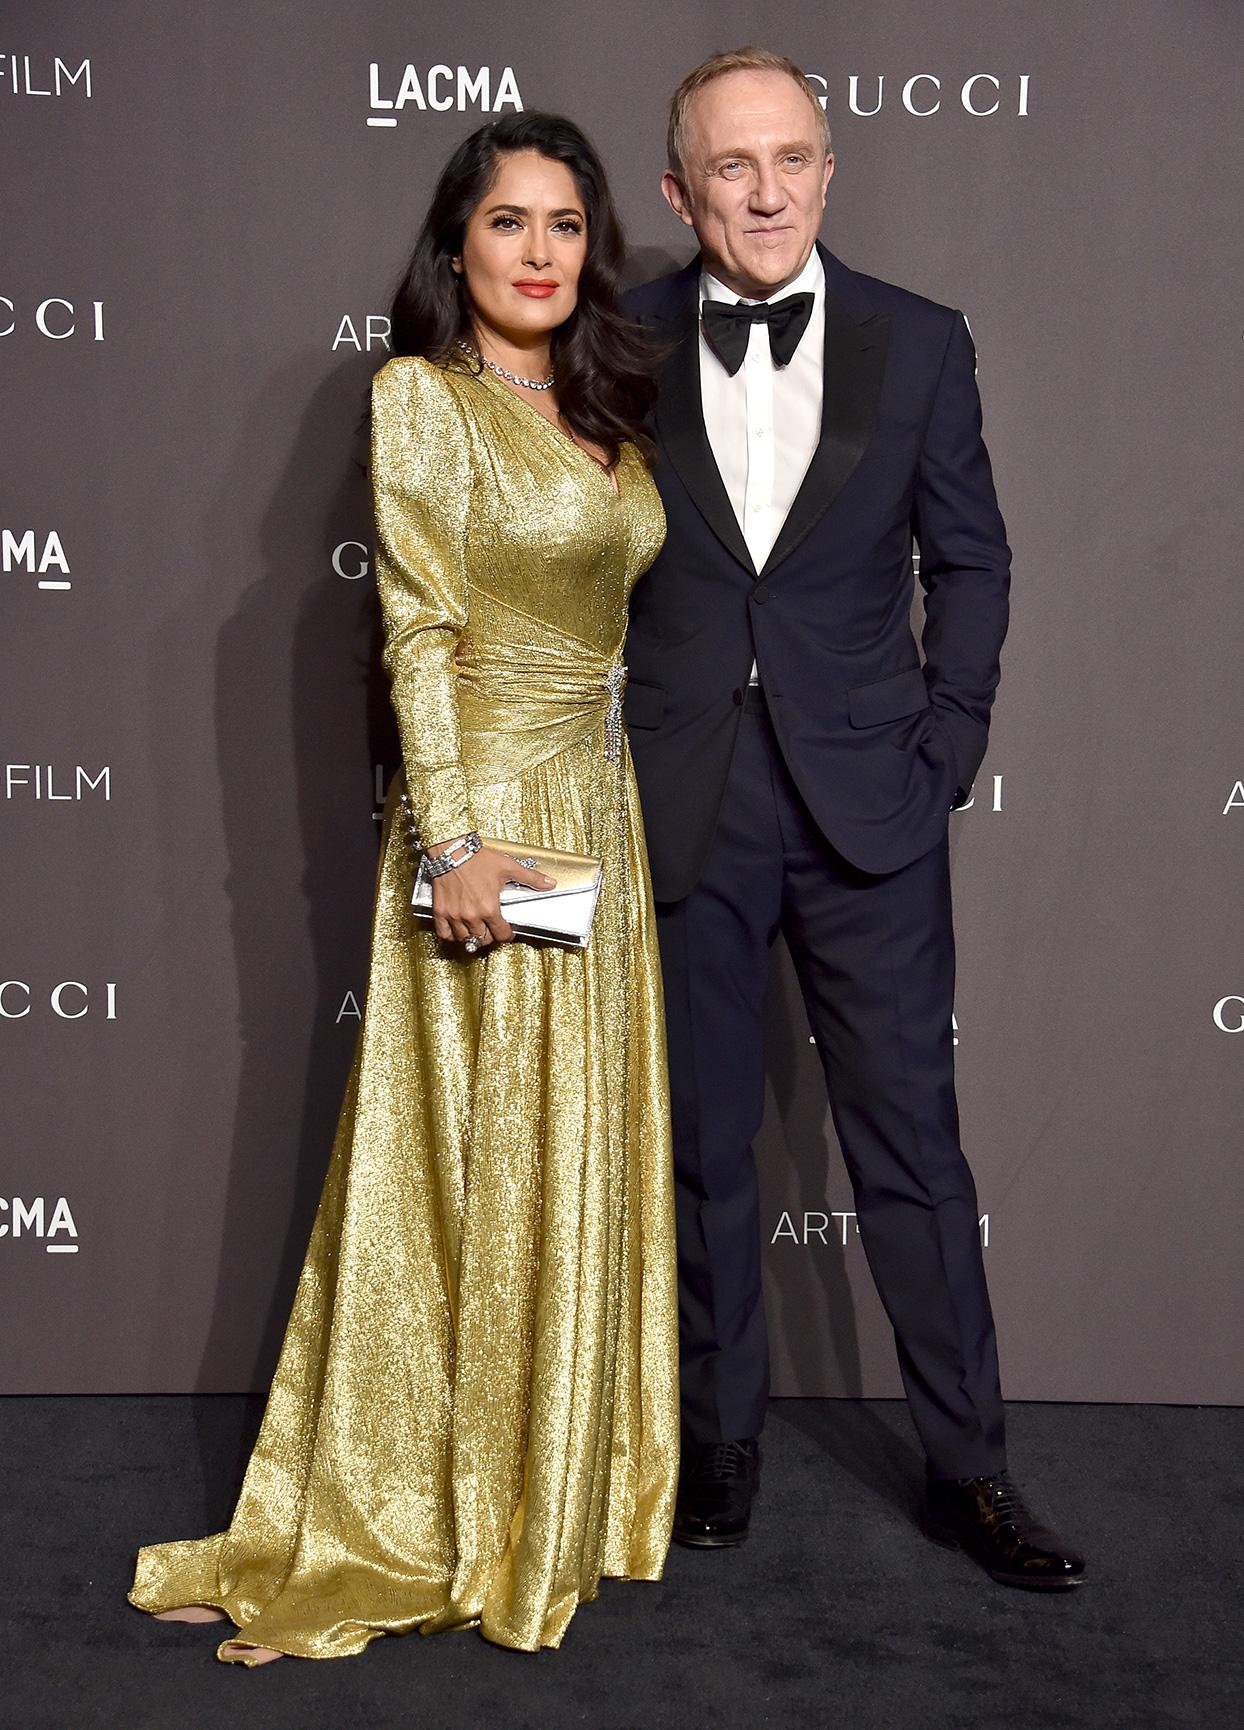 Salma Hayek and Francois-Henri Pinault couple